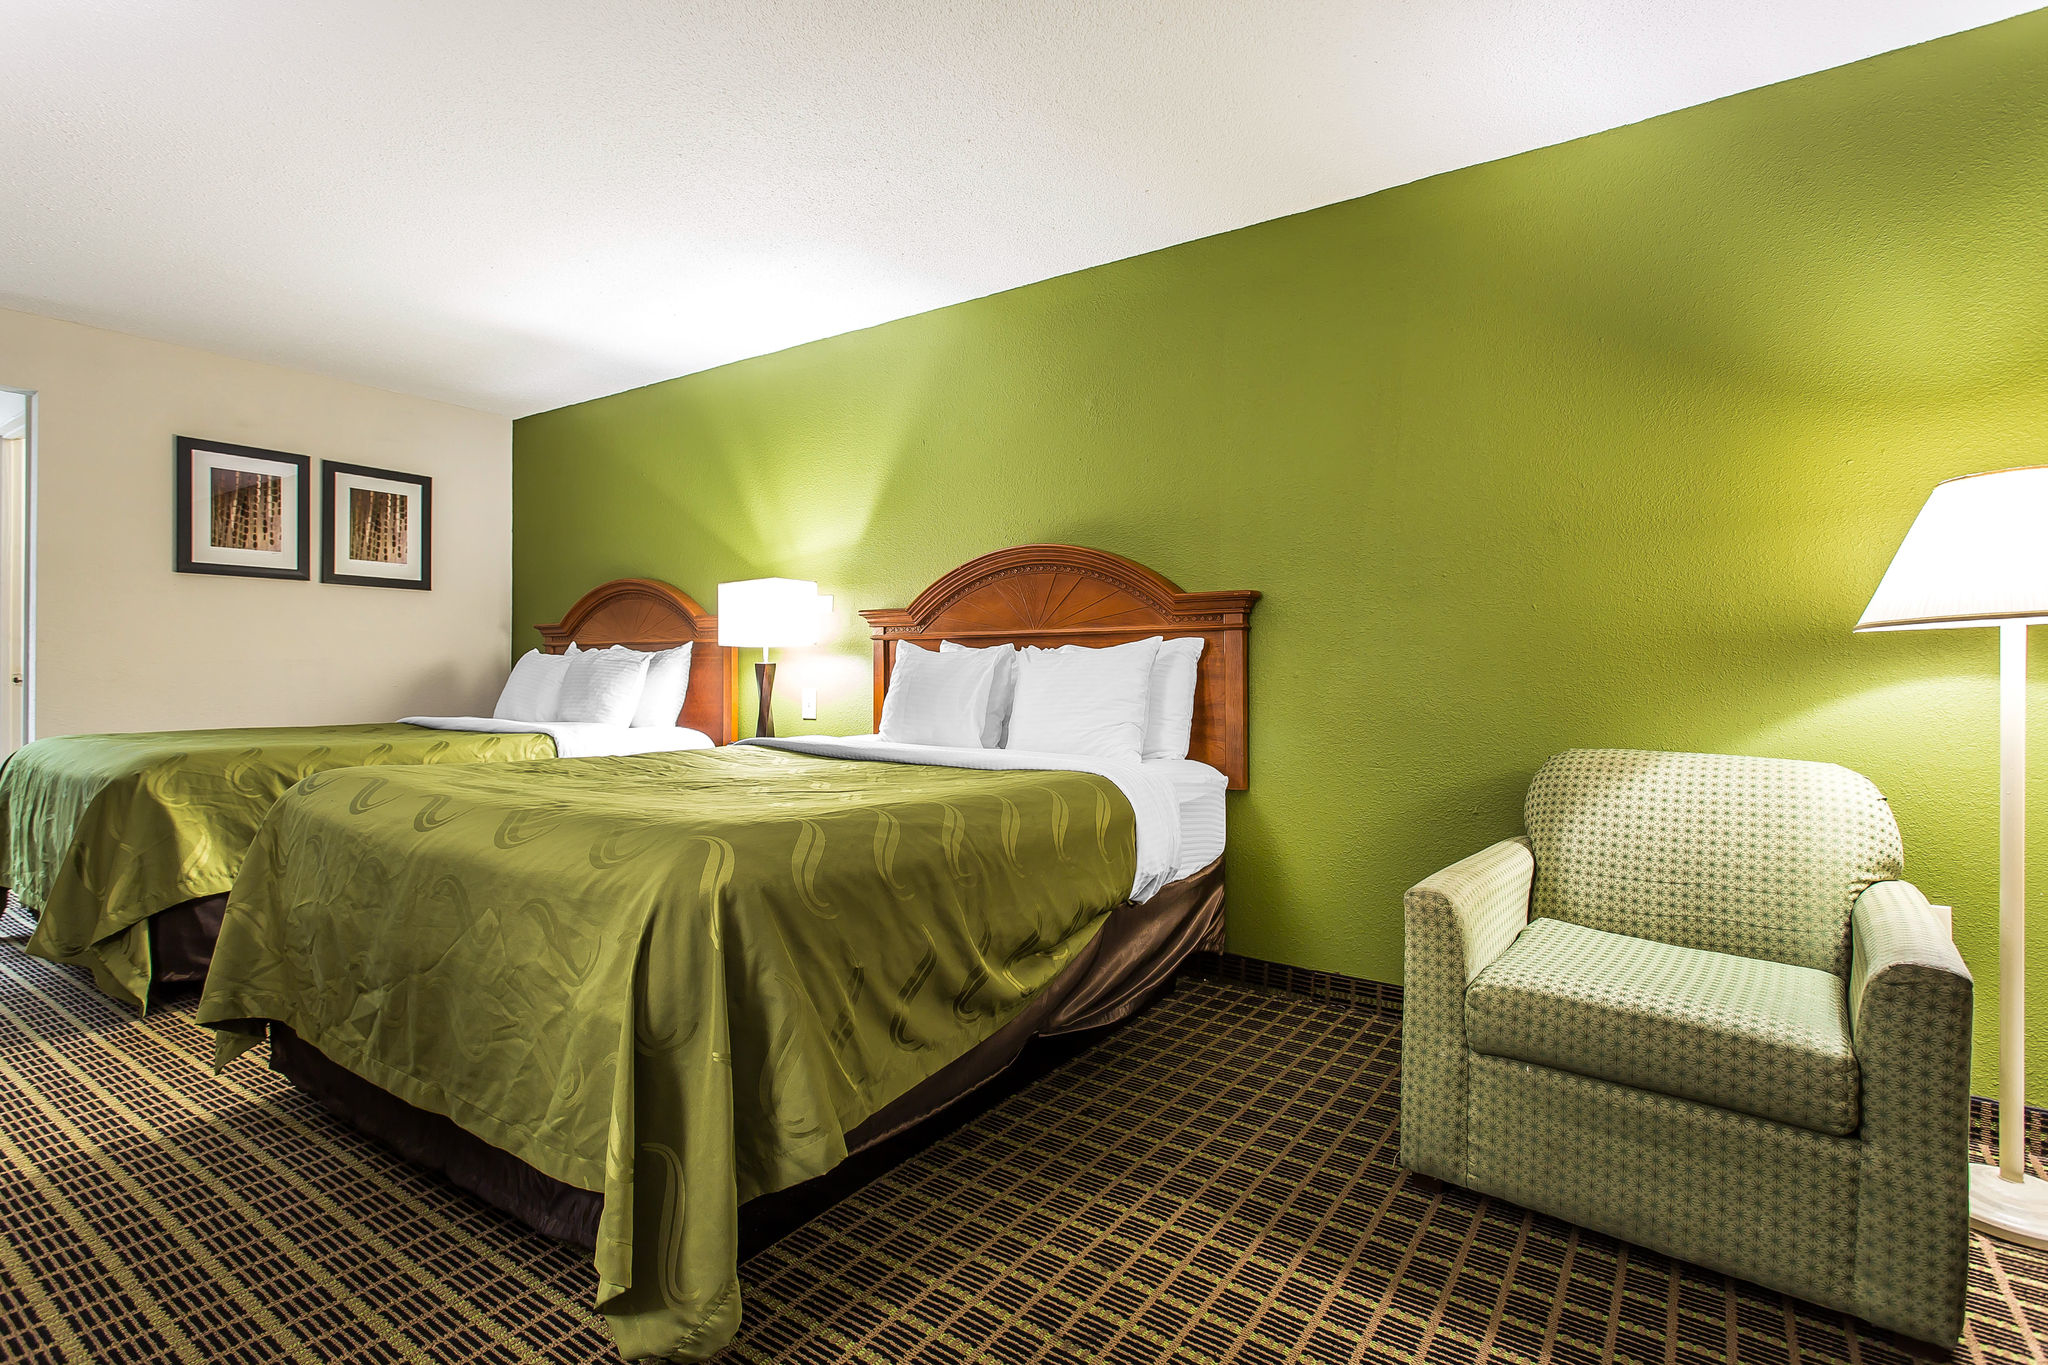 quality inn amp suites coupons orangeburg sc near me 8coupons